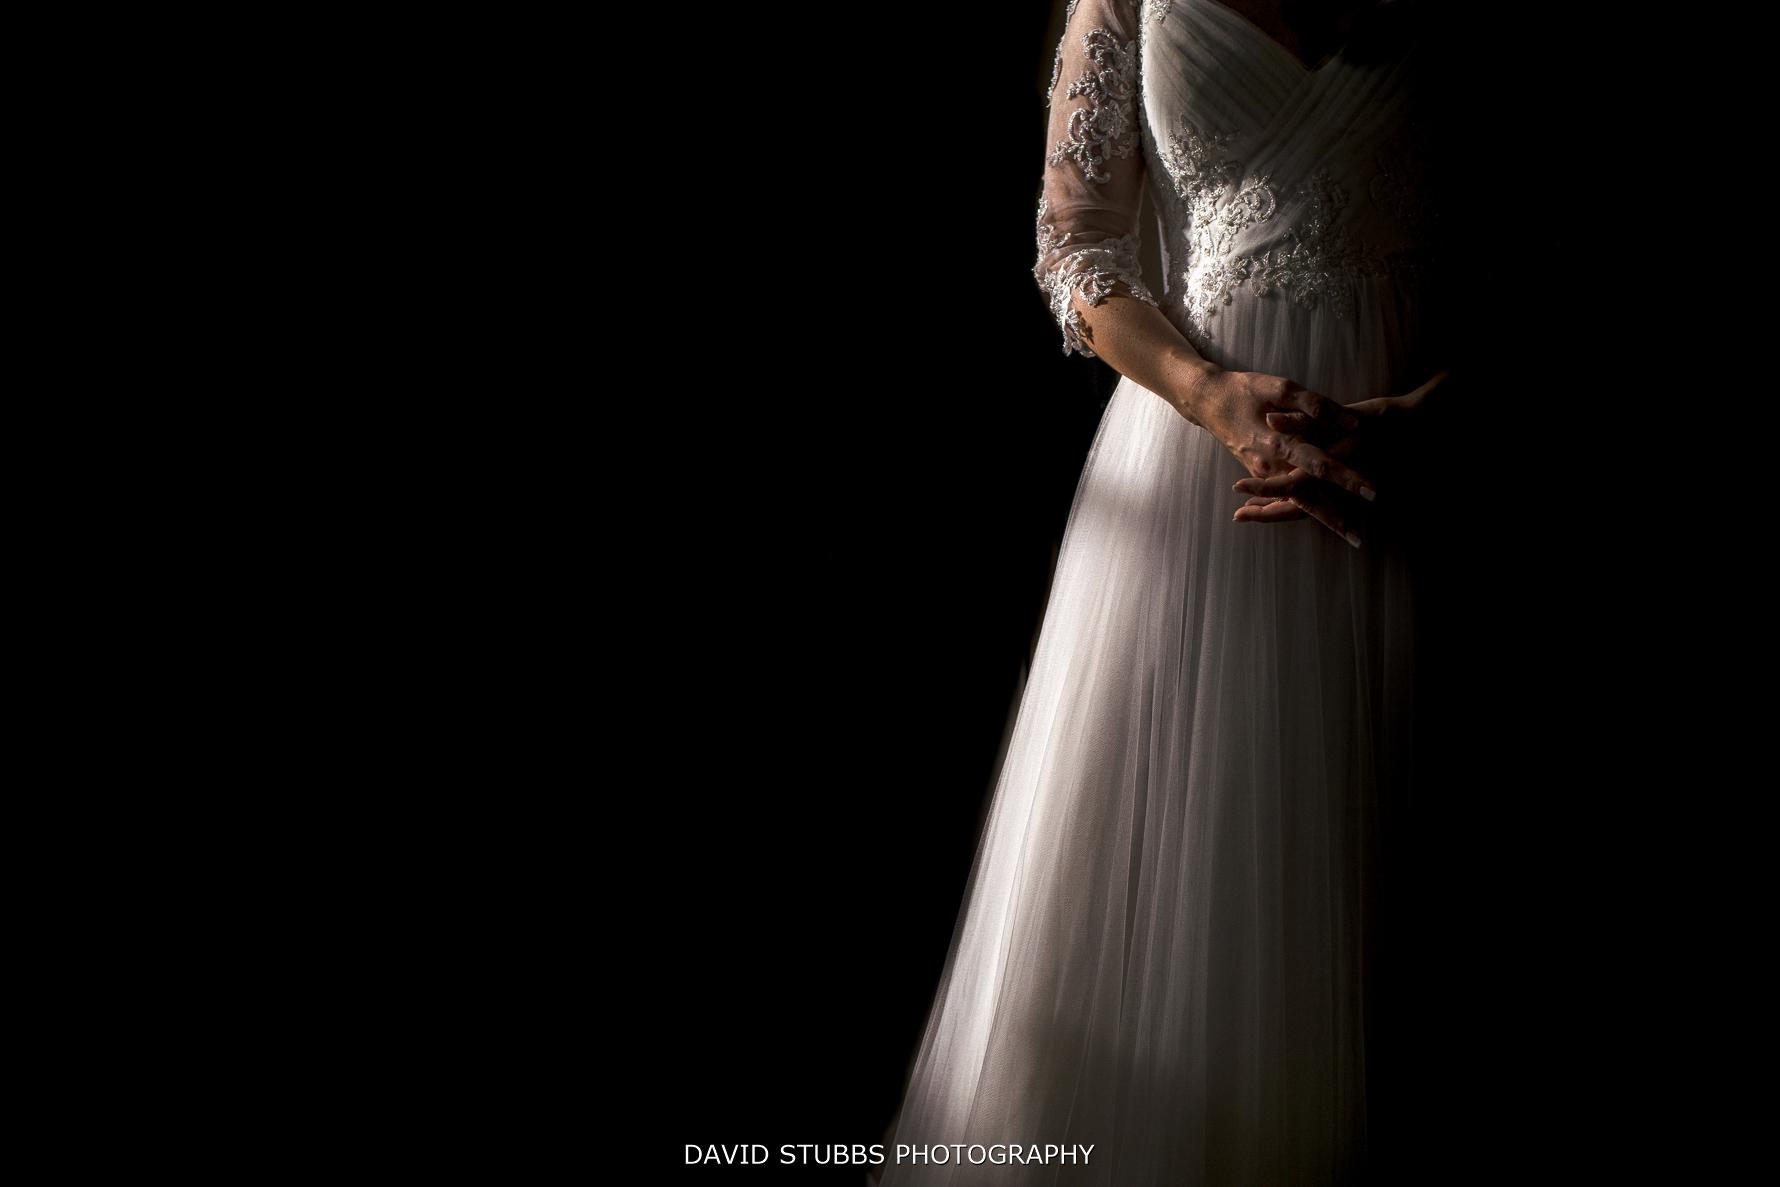 wedding dress in all its glory